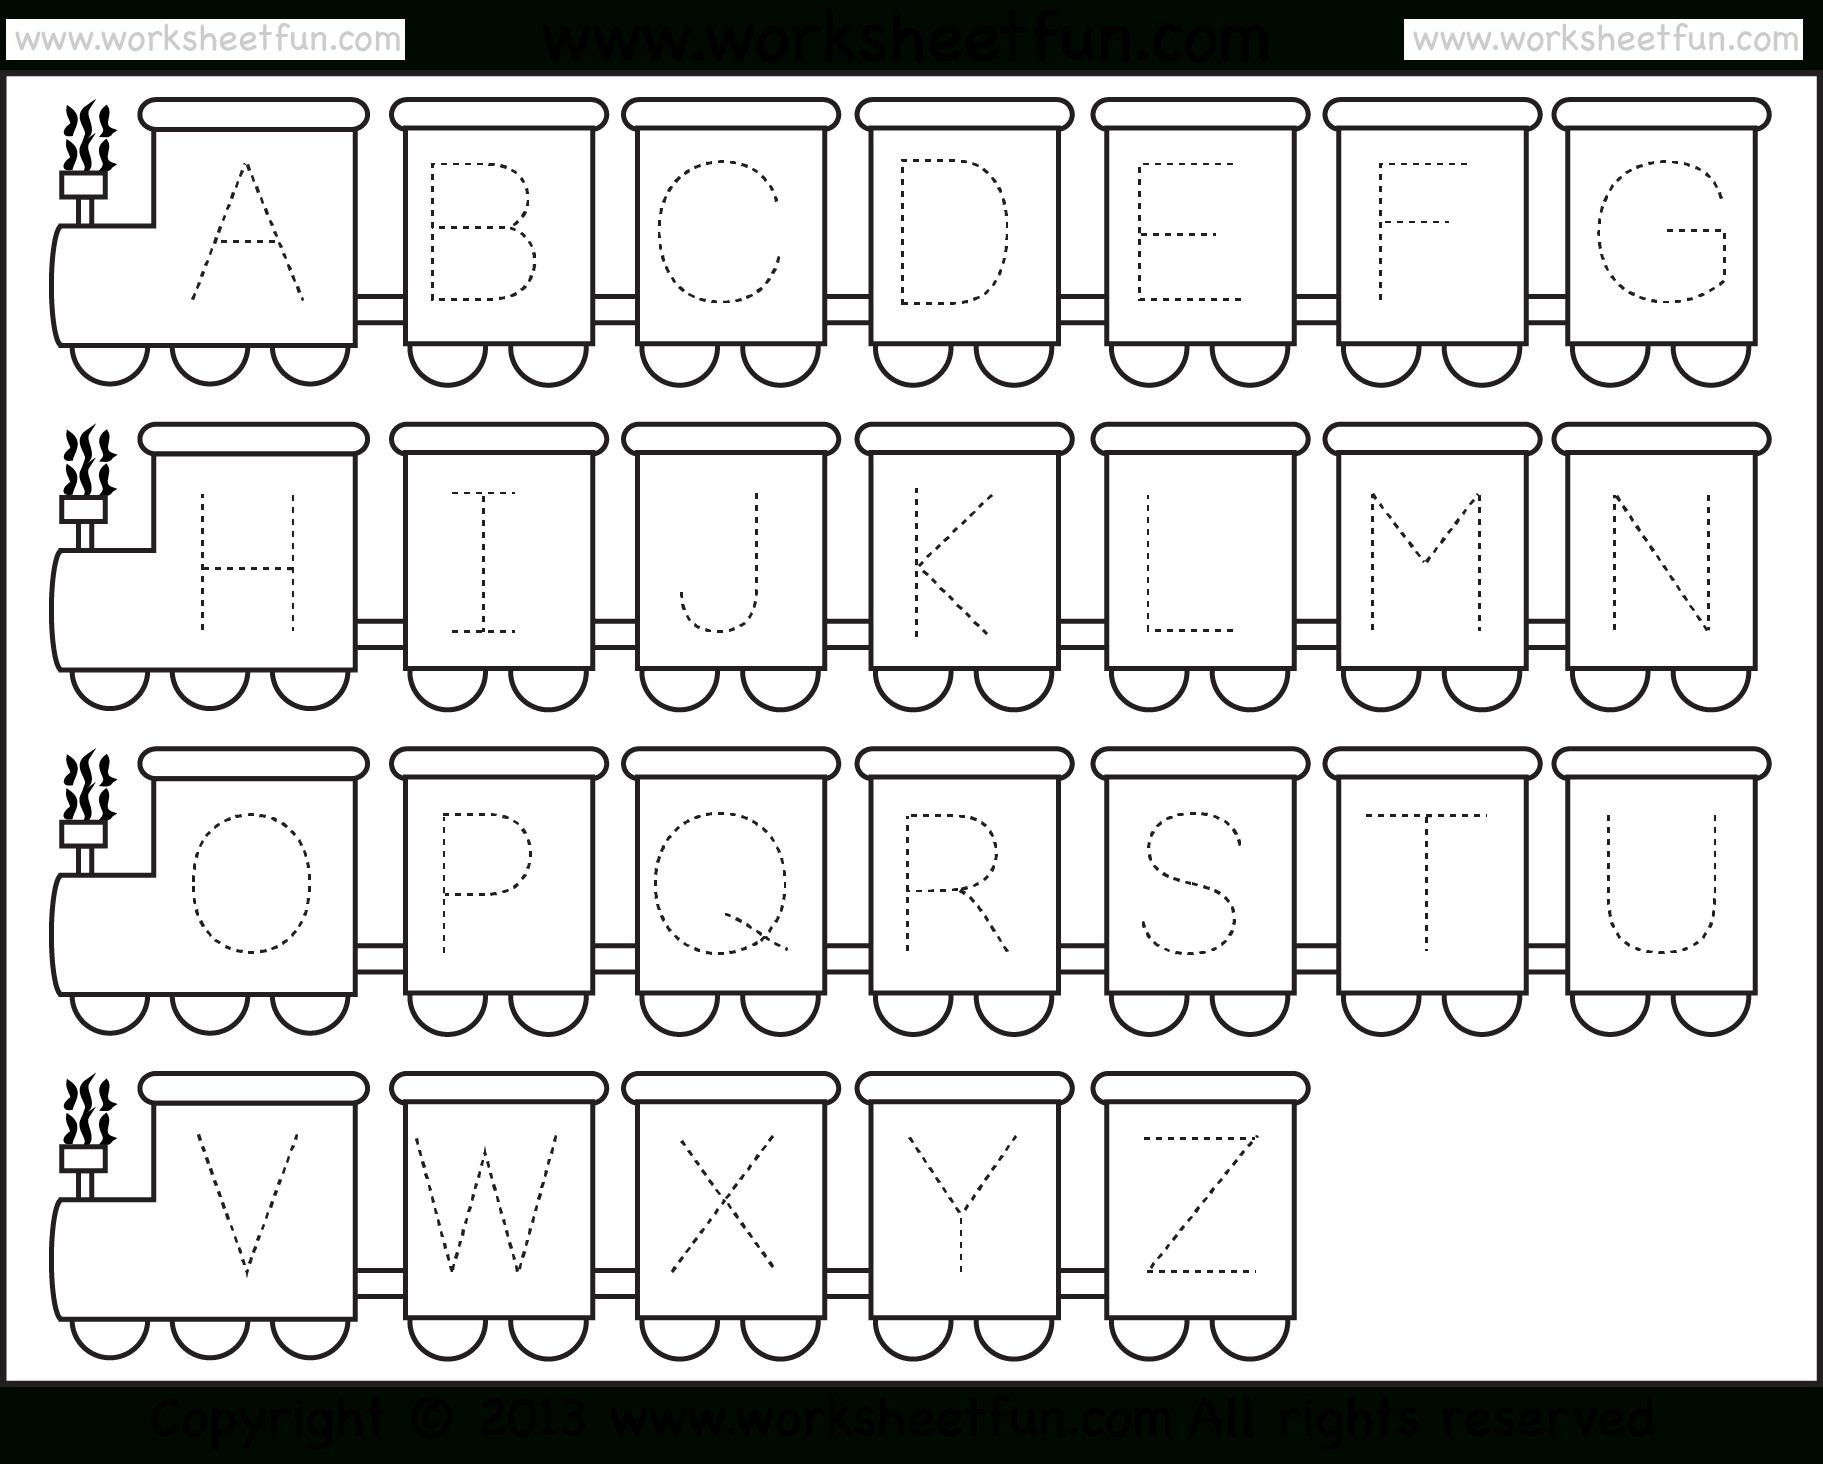 Letter Tracing Worksheet – Train Theme / Free Printable Worksheets | Alphabet Worksheets For Preschoolers Printable